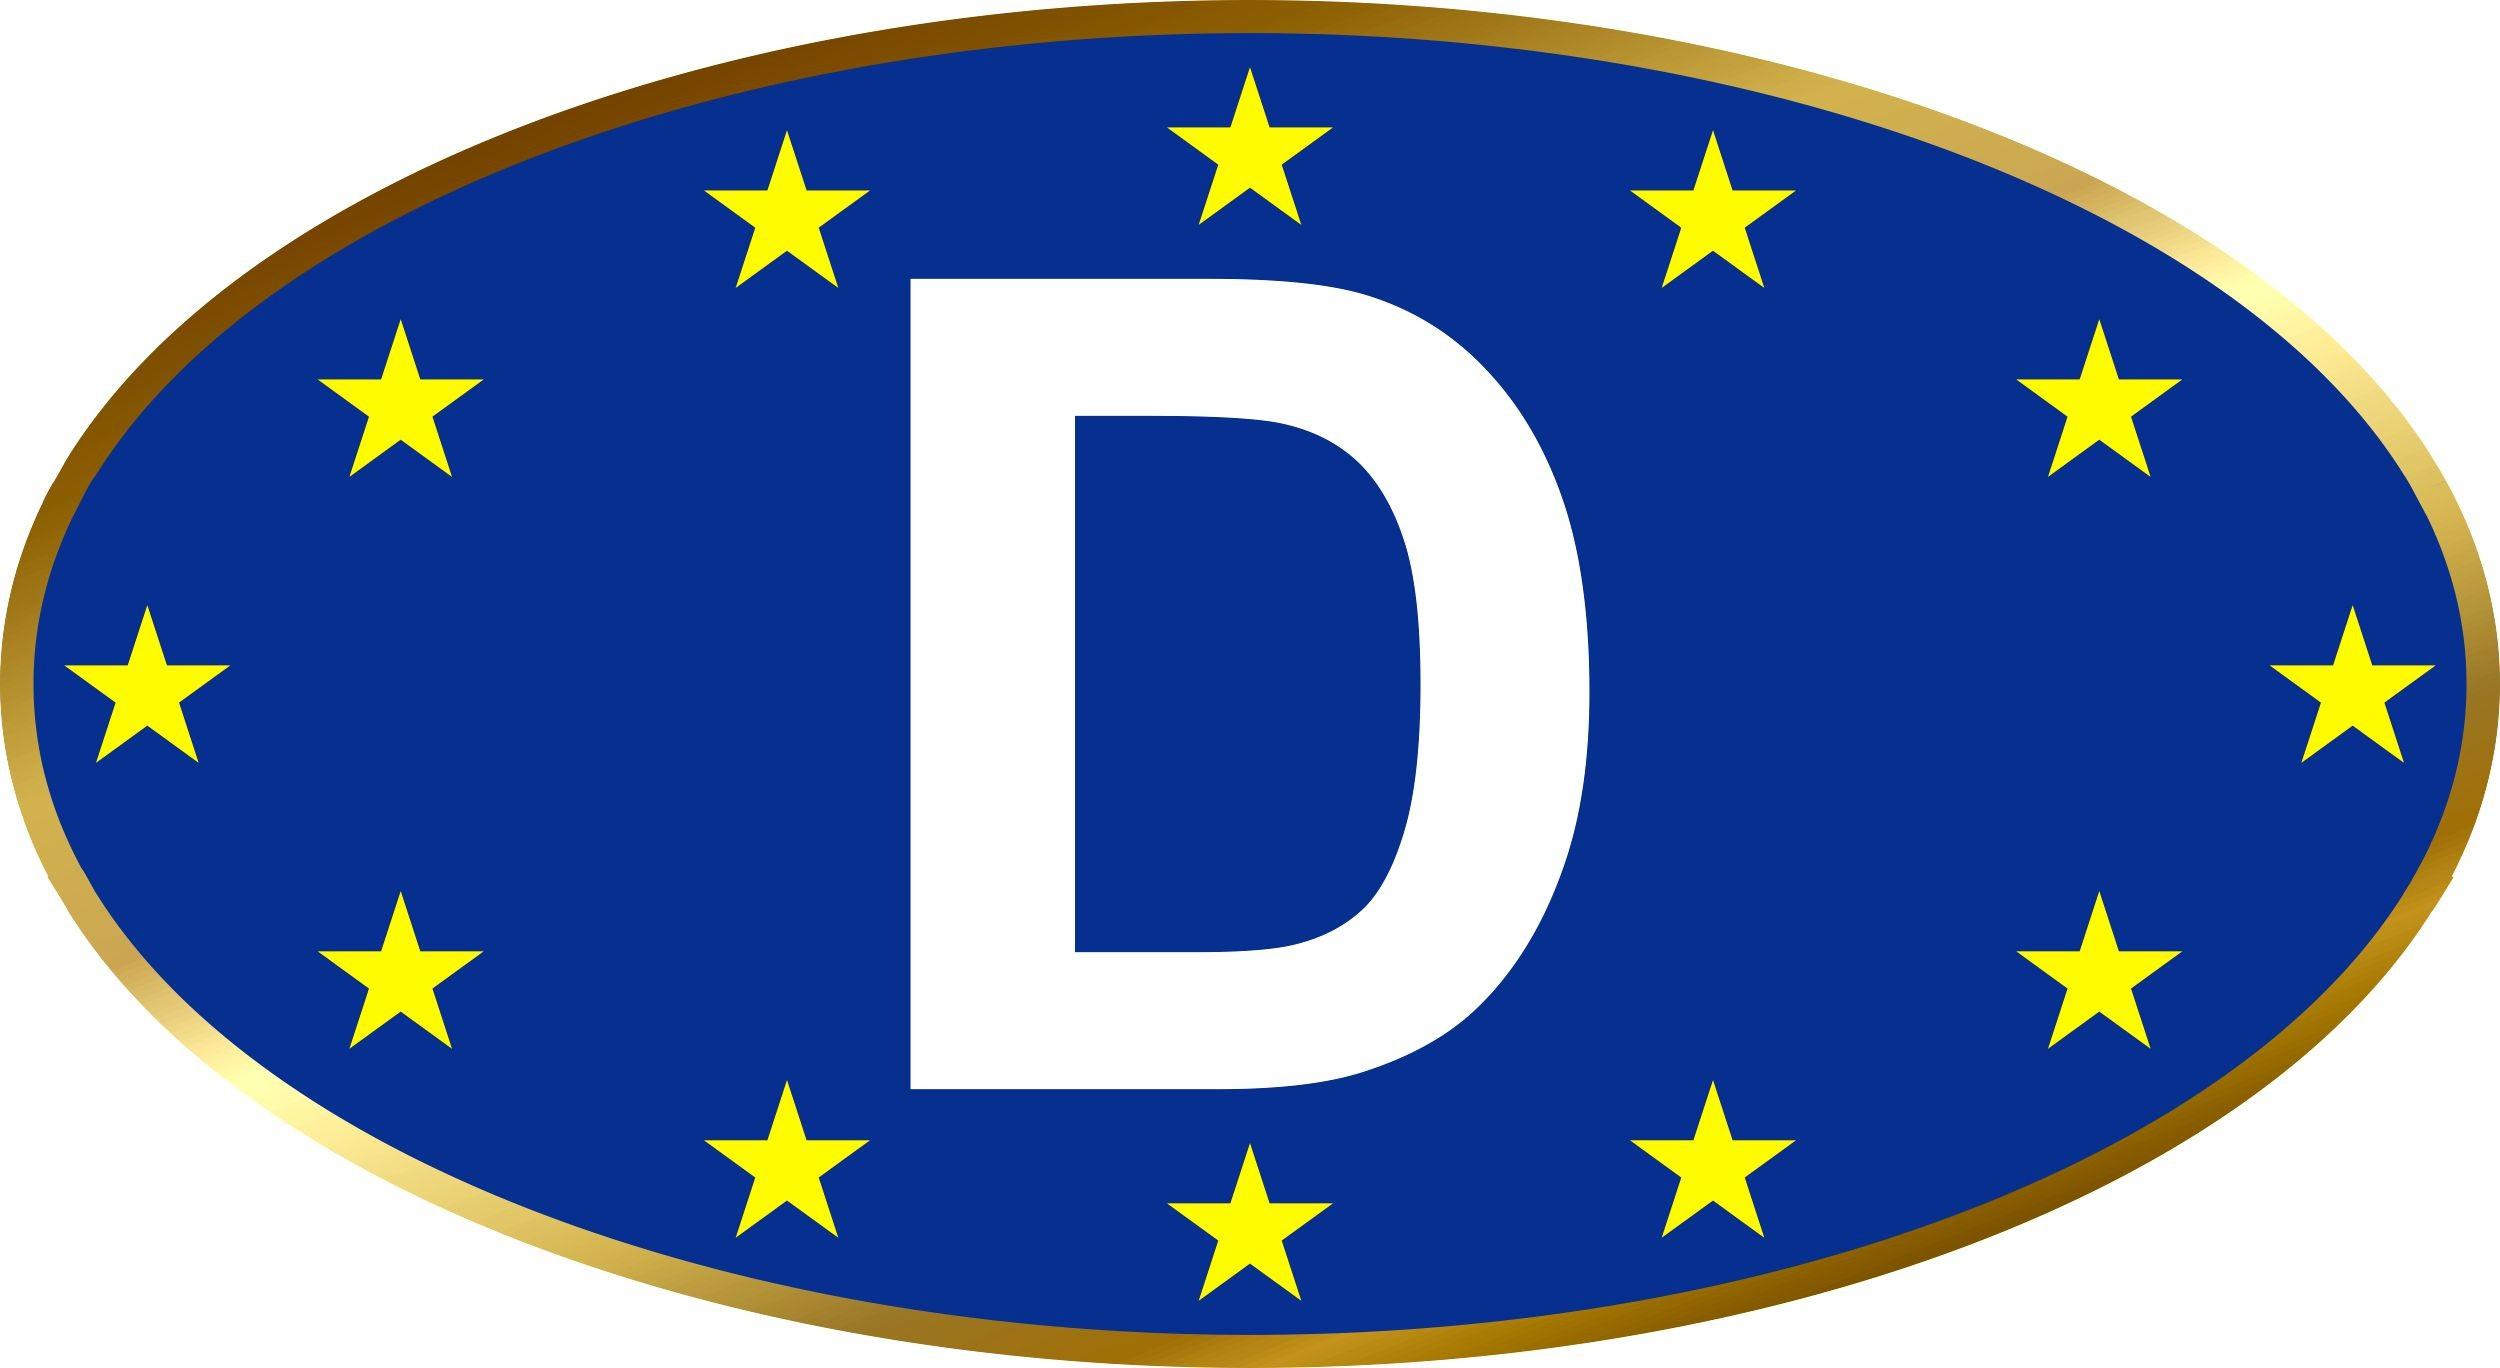 Autocollant l'Europe-D dimension 40 x 75 mm – Bild 1